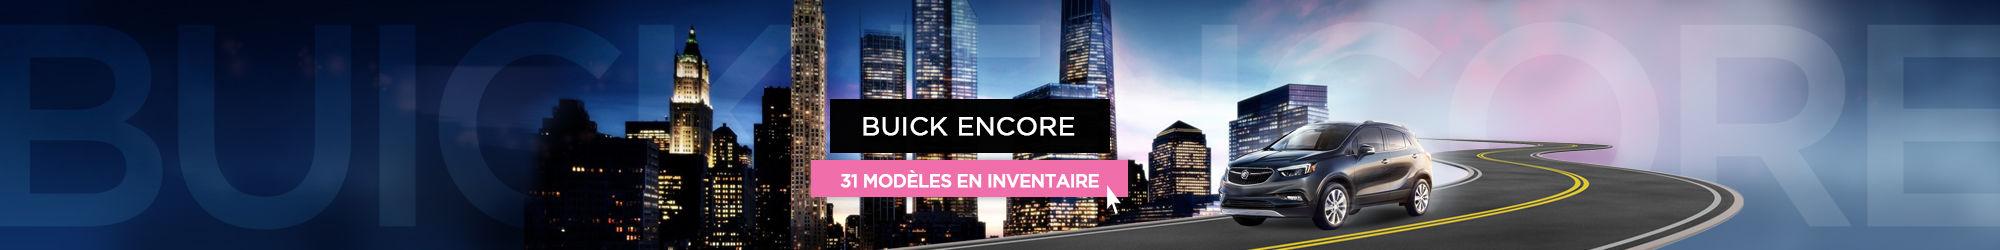 Buick Encore 2018 en inventaire